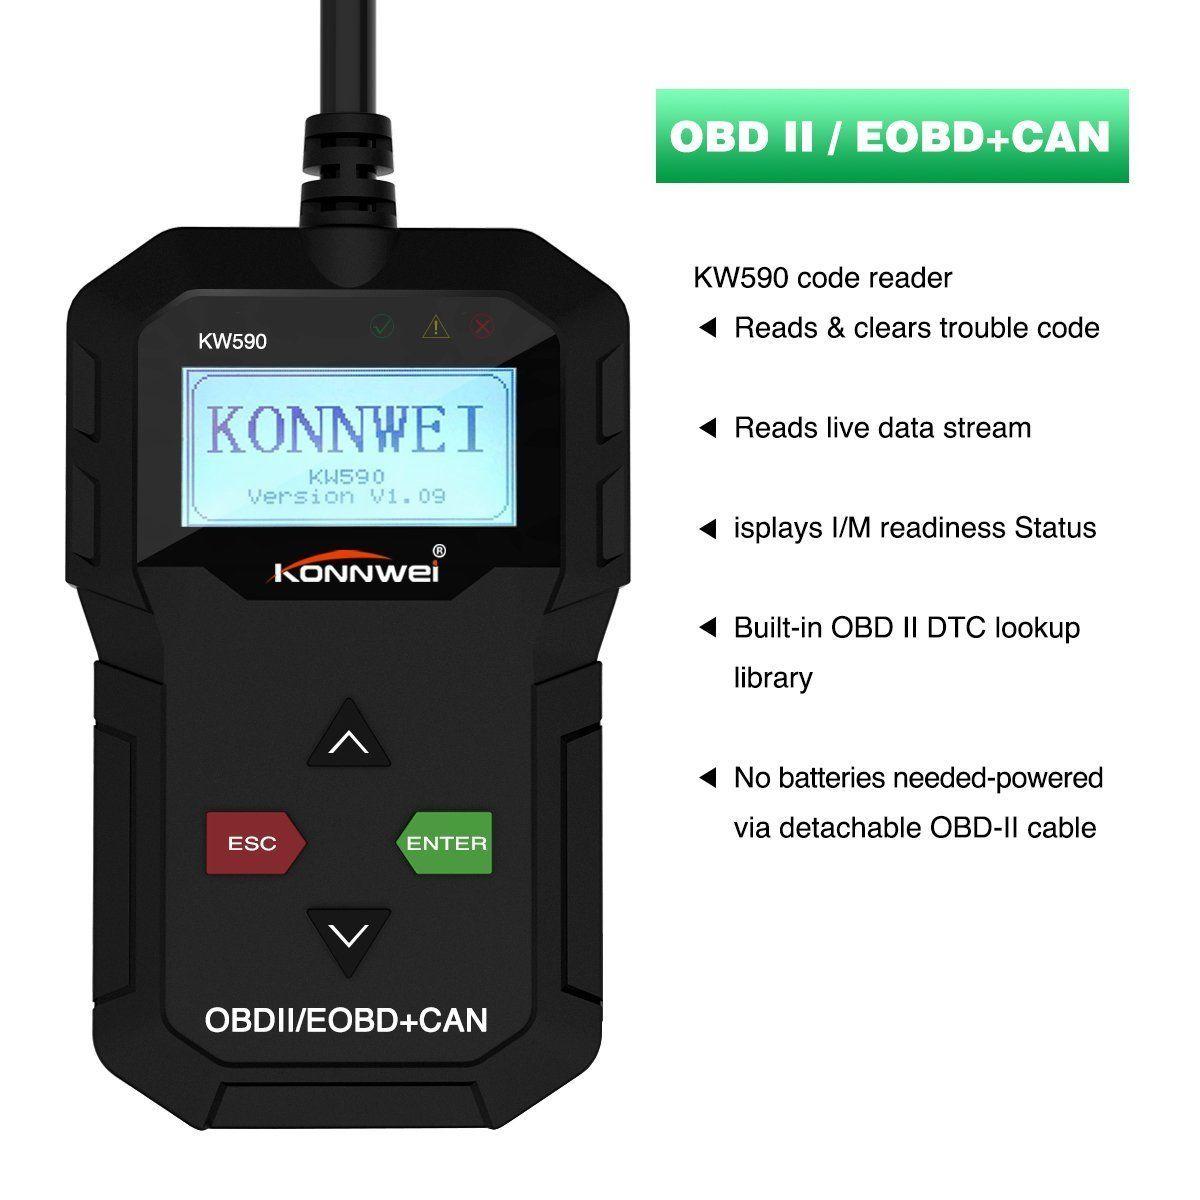 Kw590 Obdii Obd2 Eobd Auto Car Engine Scanner Code Reader